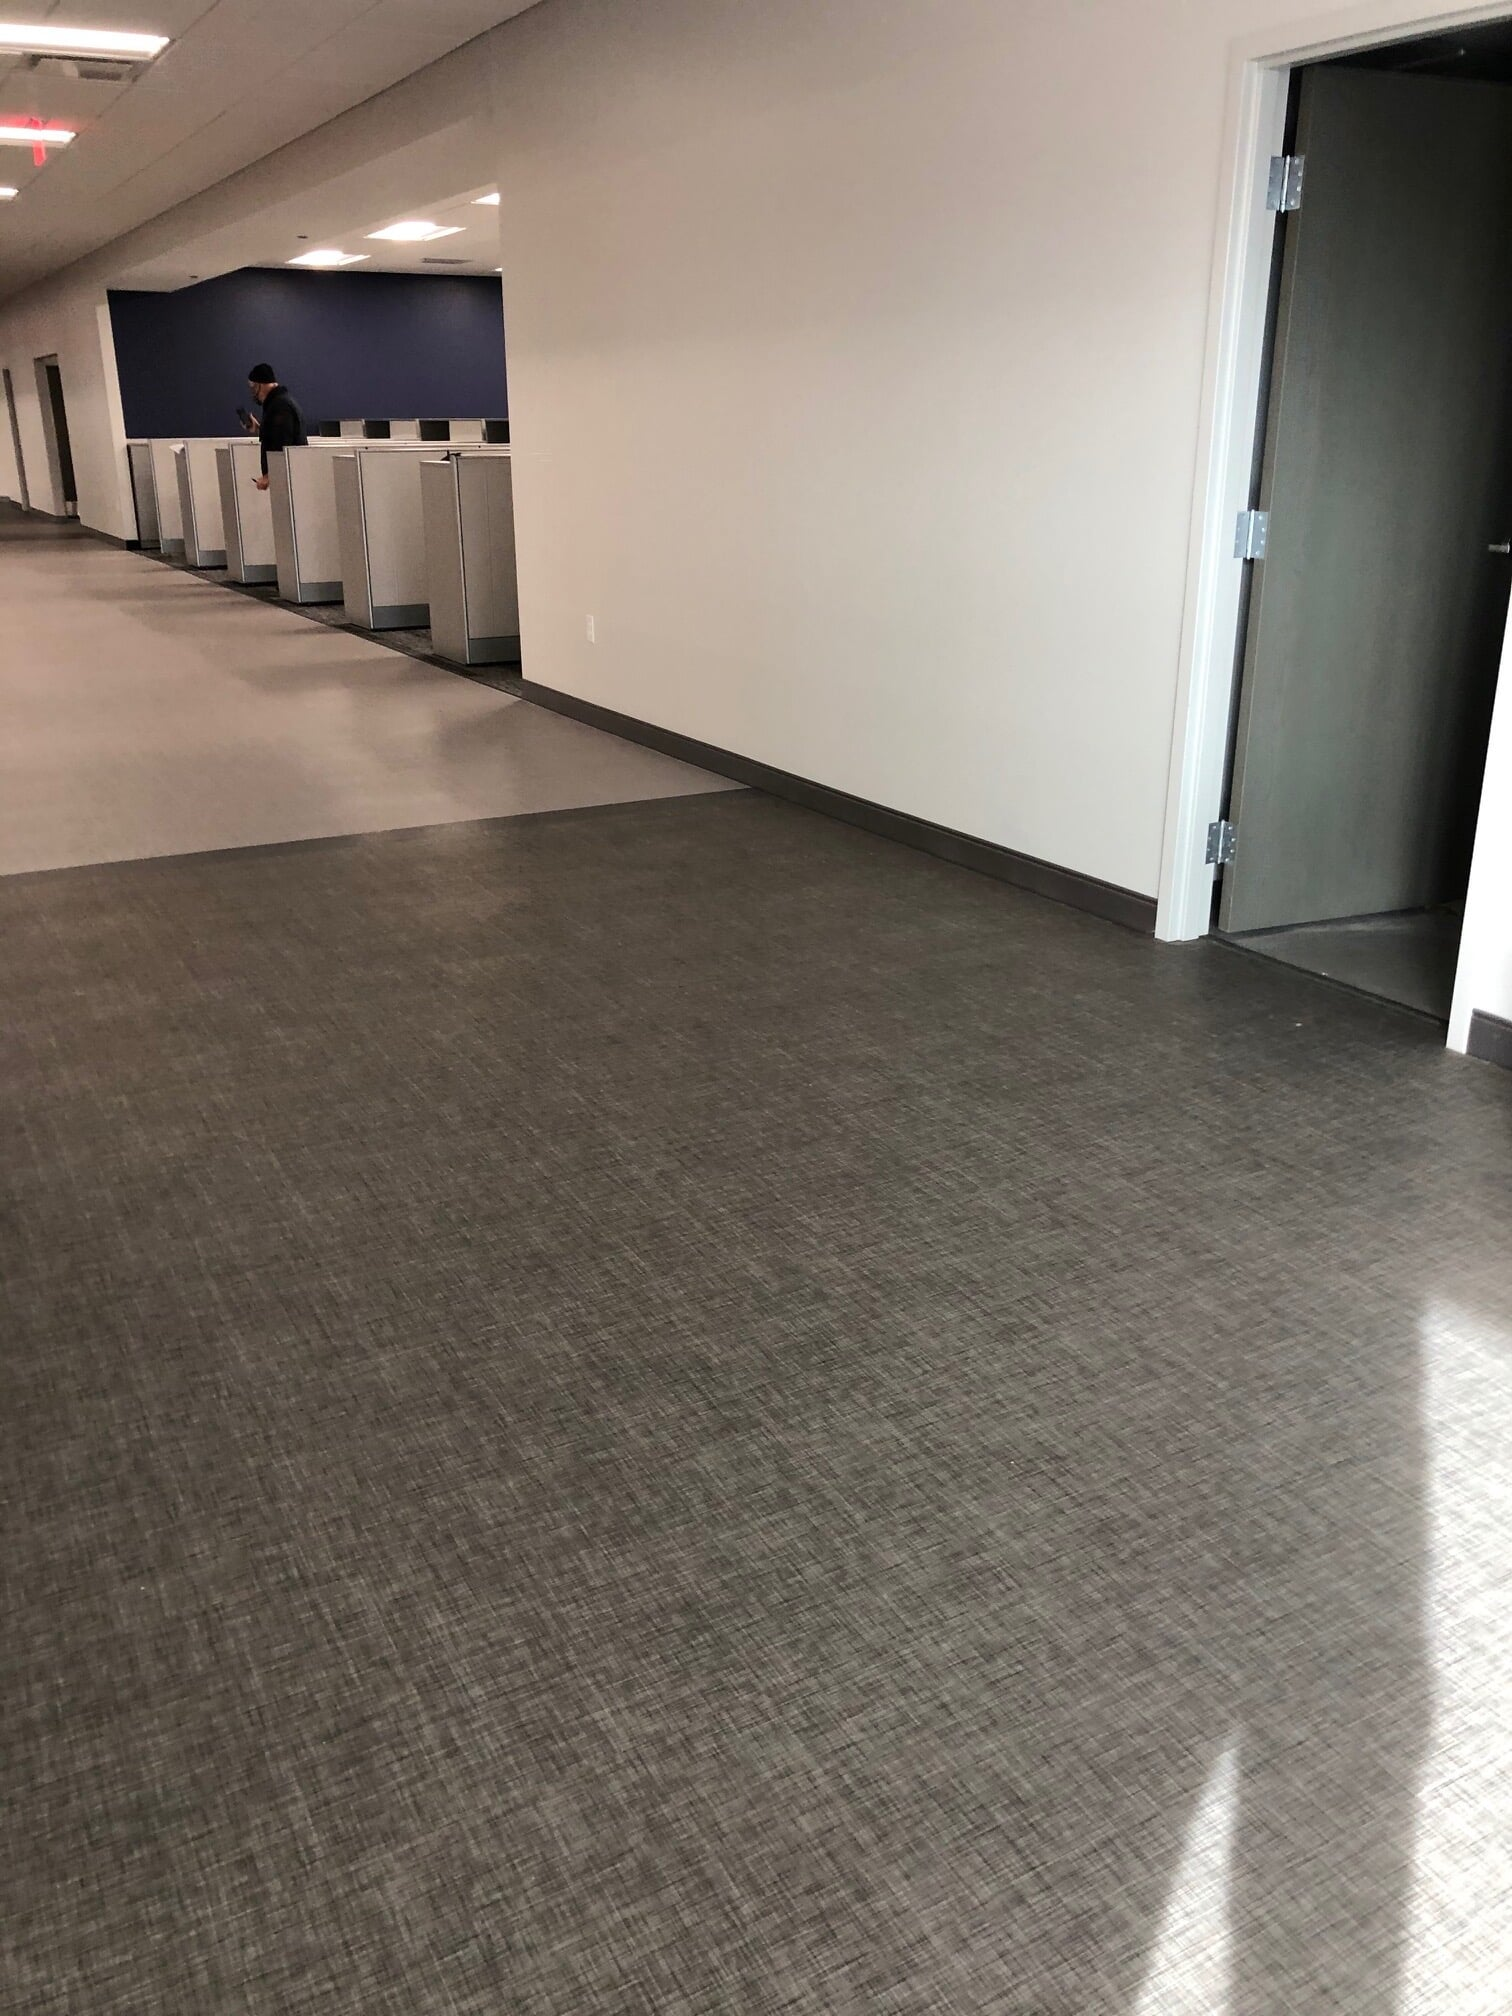 Business flooring in  from Barrington Carpet & Flooring Design